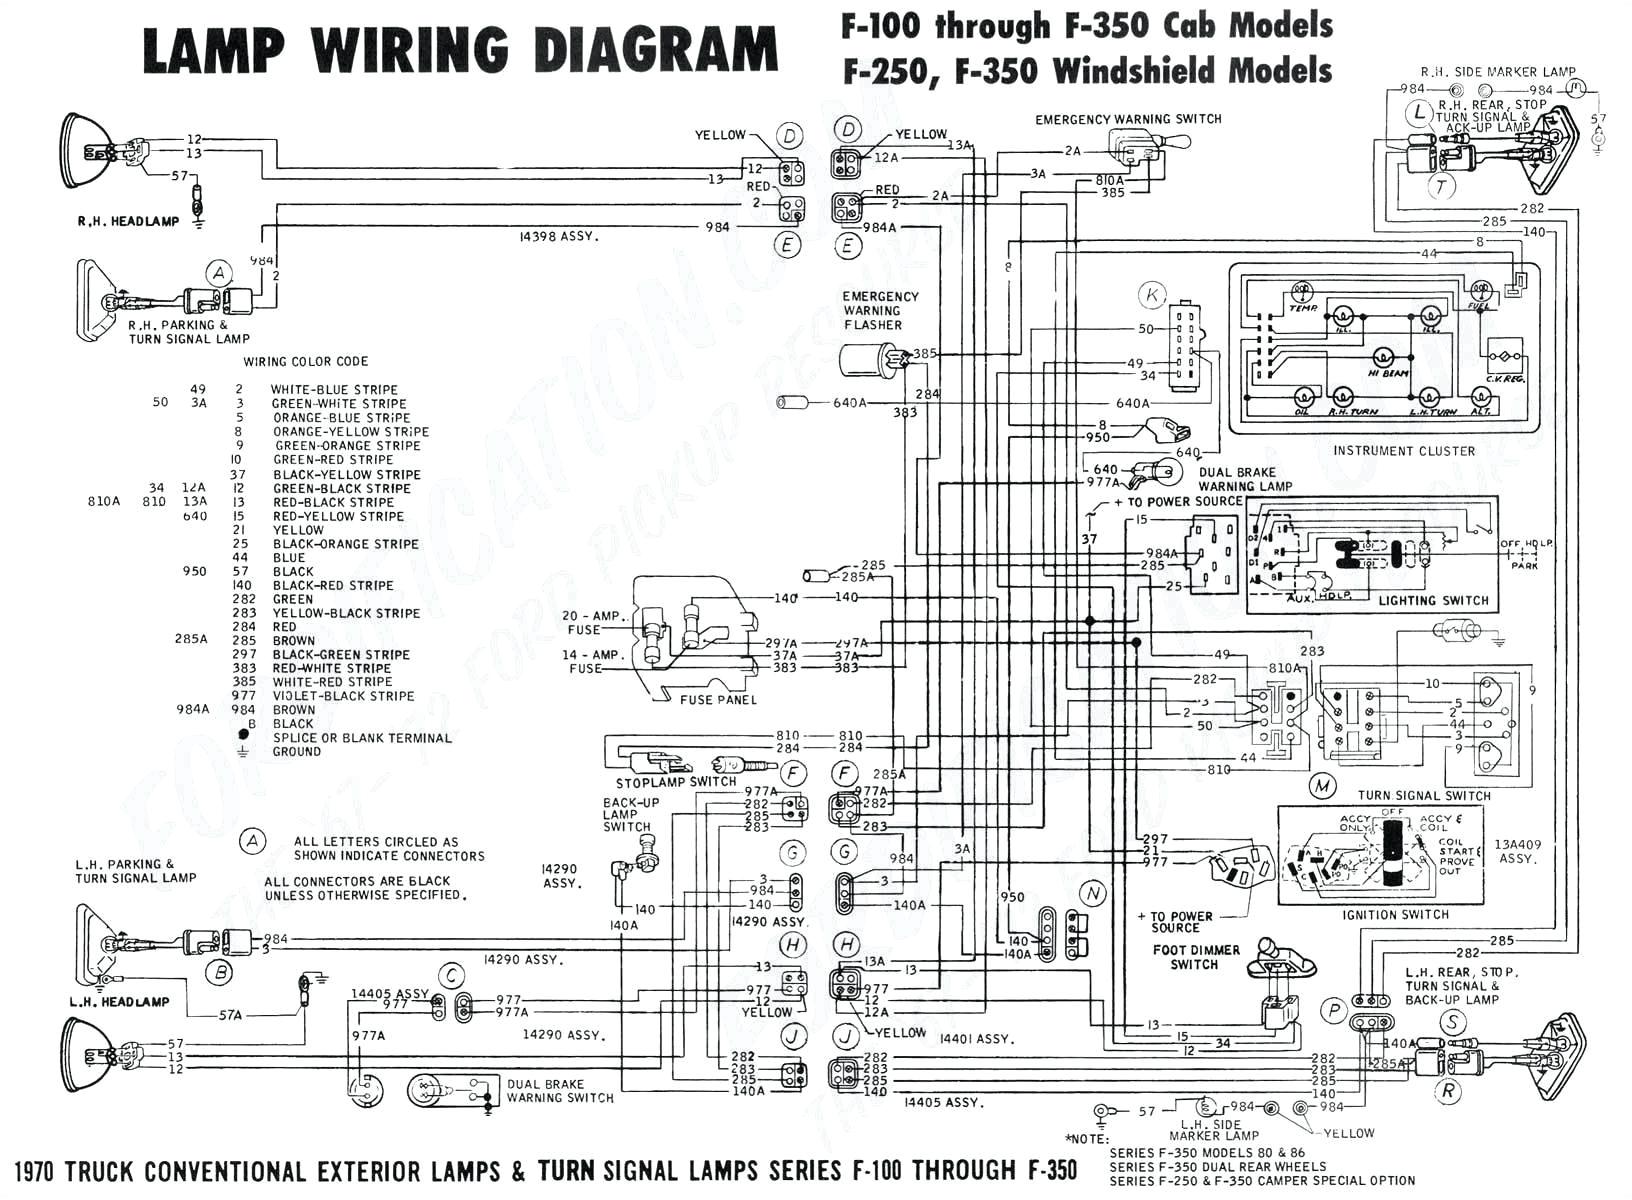 Wildfire 250 Wiring Diagram -Exmark Wire Harness | Begeboy Wiring Diagram  Source | Wildfire 250 Wiring Diagram |  | Begeboy Wiring Diagram Source